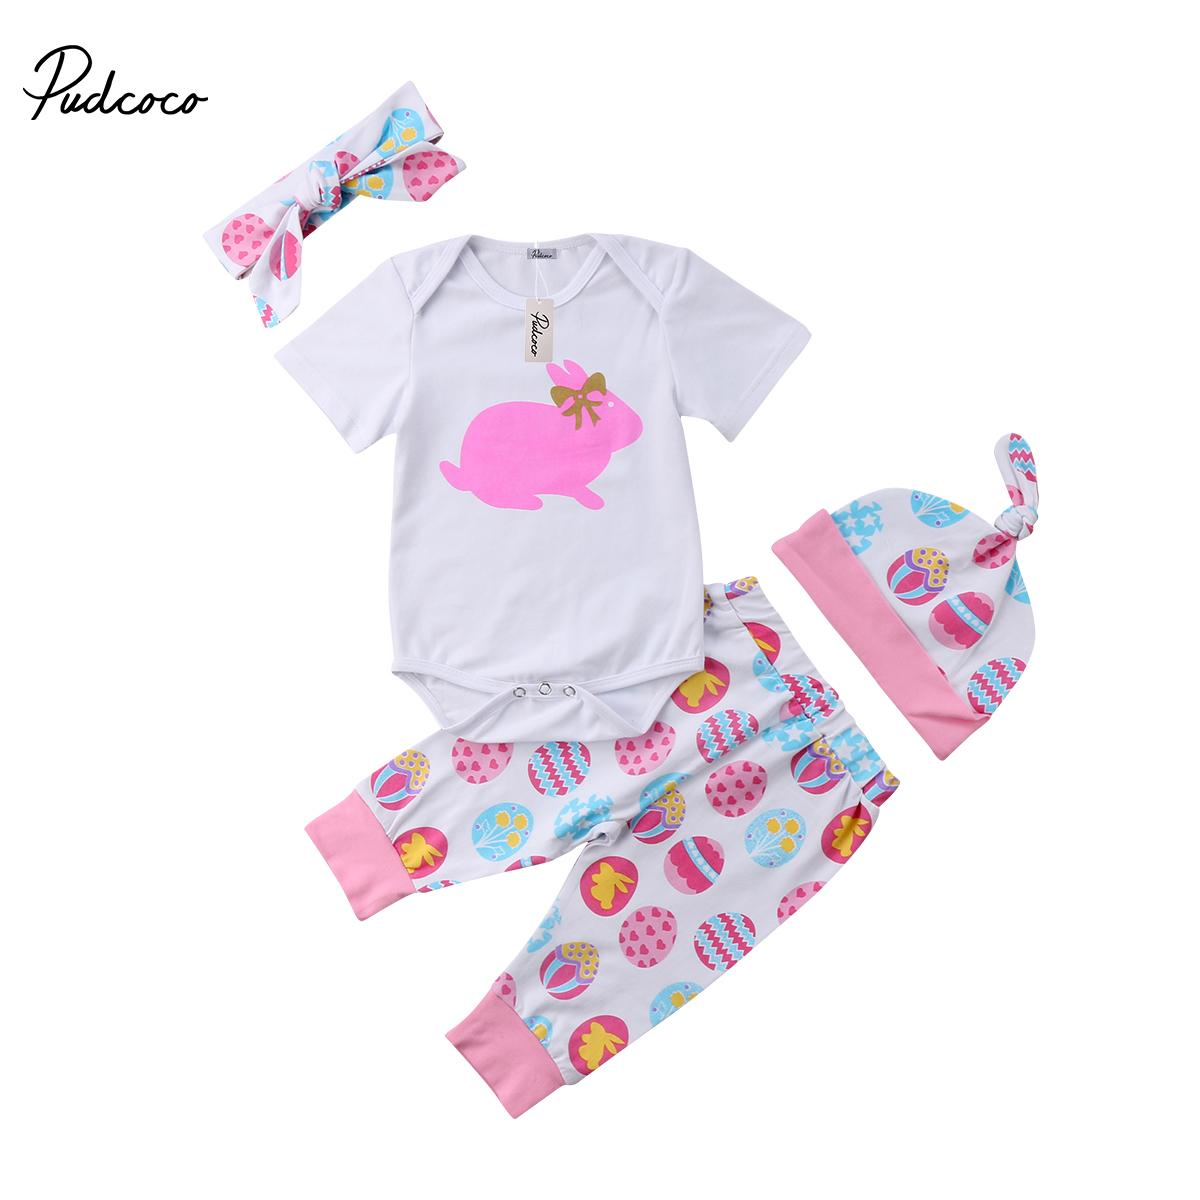 e84e3e33b Newborn Baby Girl Easter Bunny Clothes Romper Bodysuit Egg Print ...